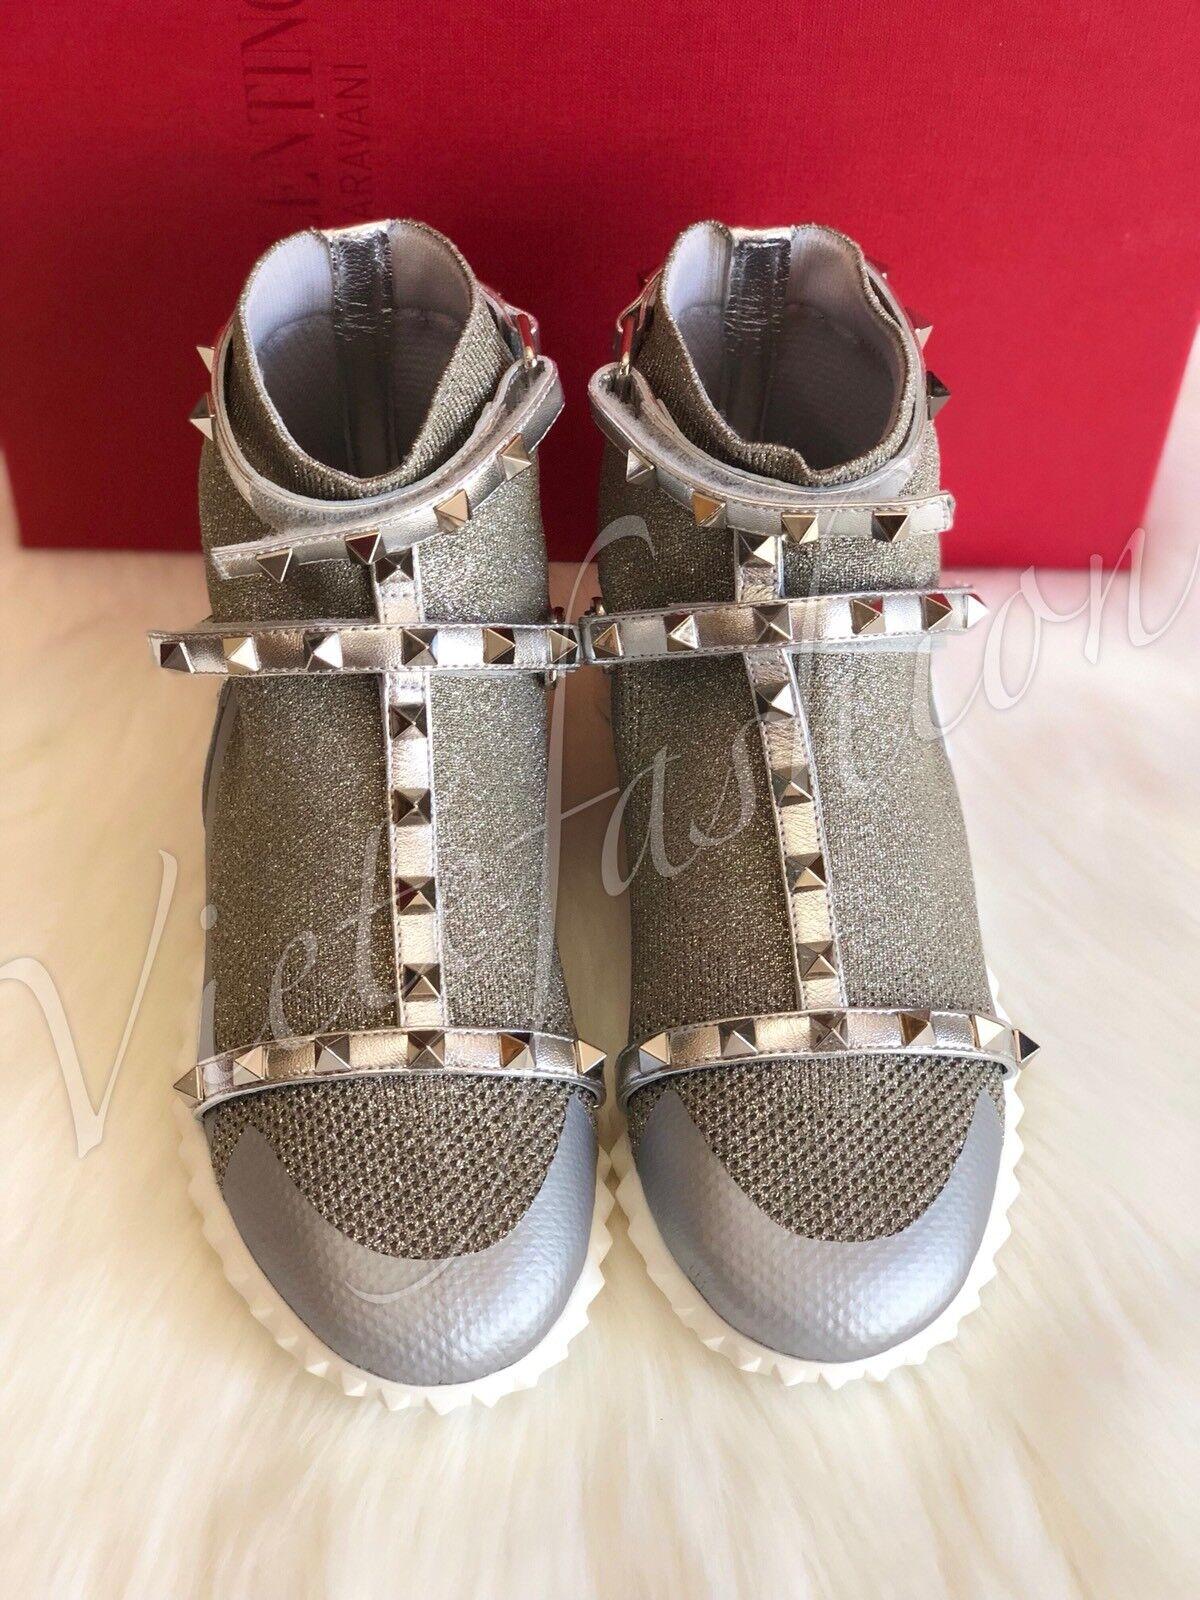 NIB Knit  995 Valentino Silber Rockstud Knit NIB Stiefel Größe 35 0445ef